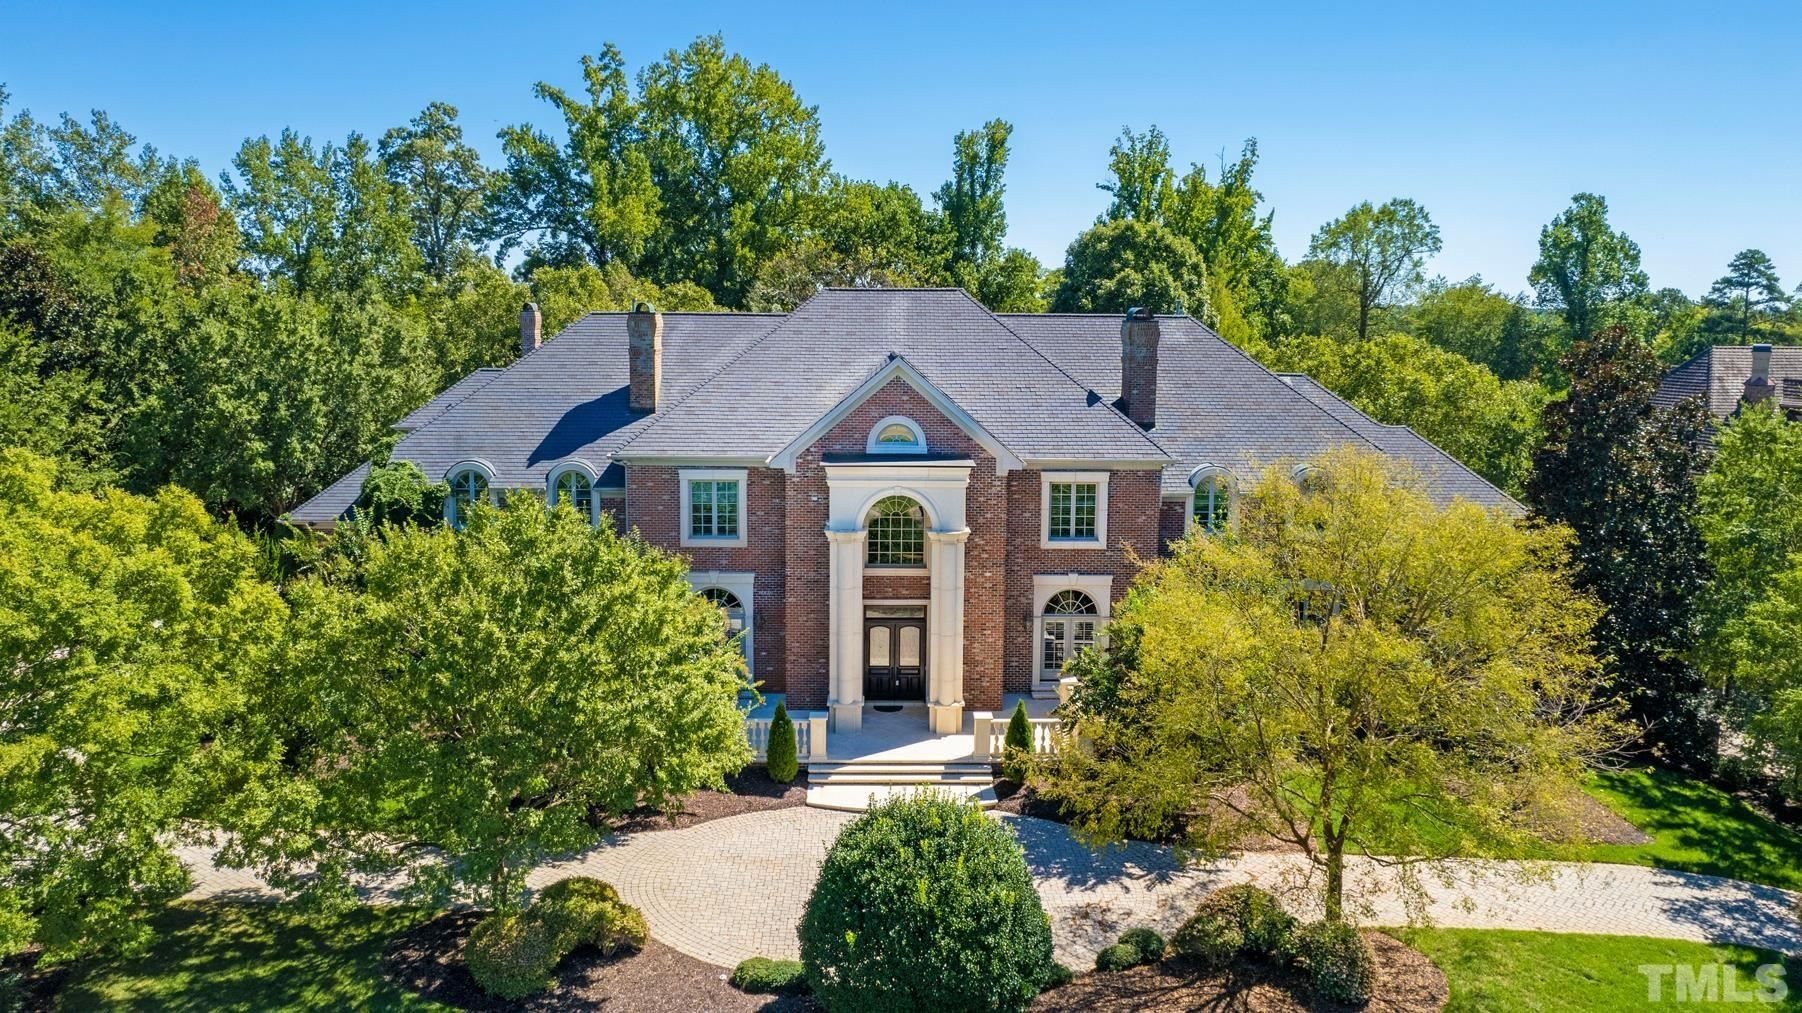 Photo of 12900 Billingsgate Lane, Raleigh, NC 27614 (MLS # 2410596)